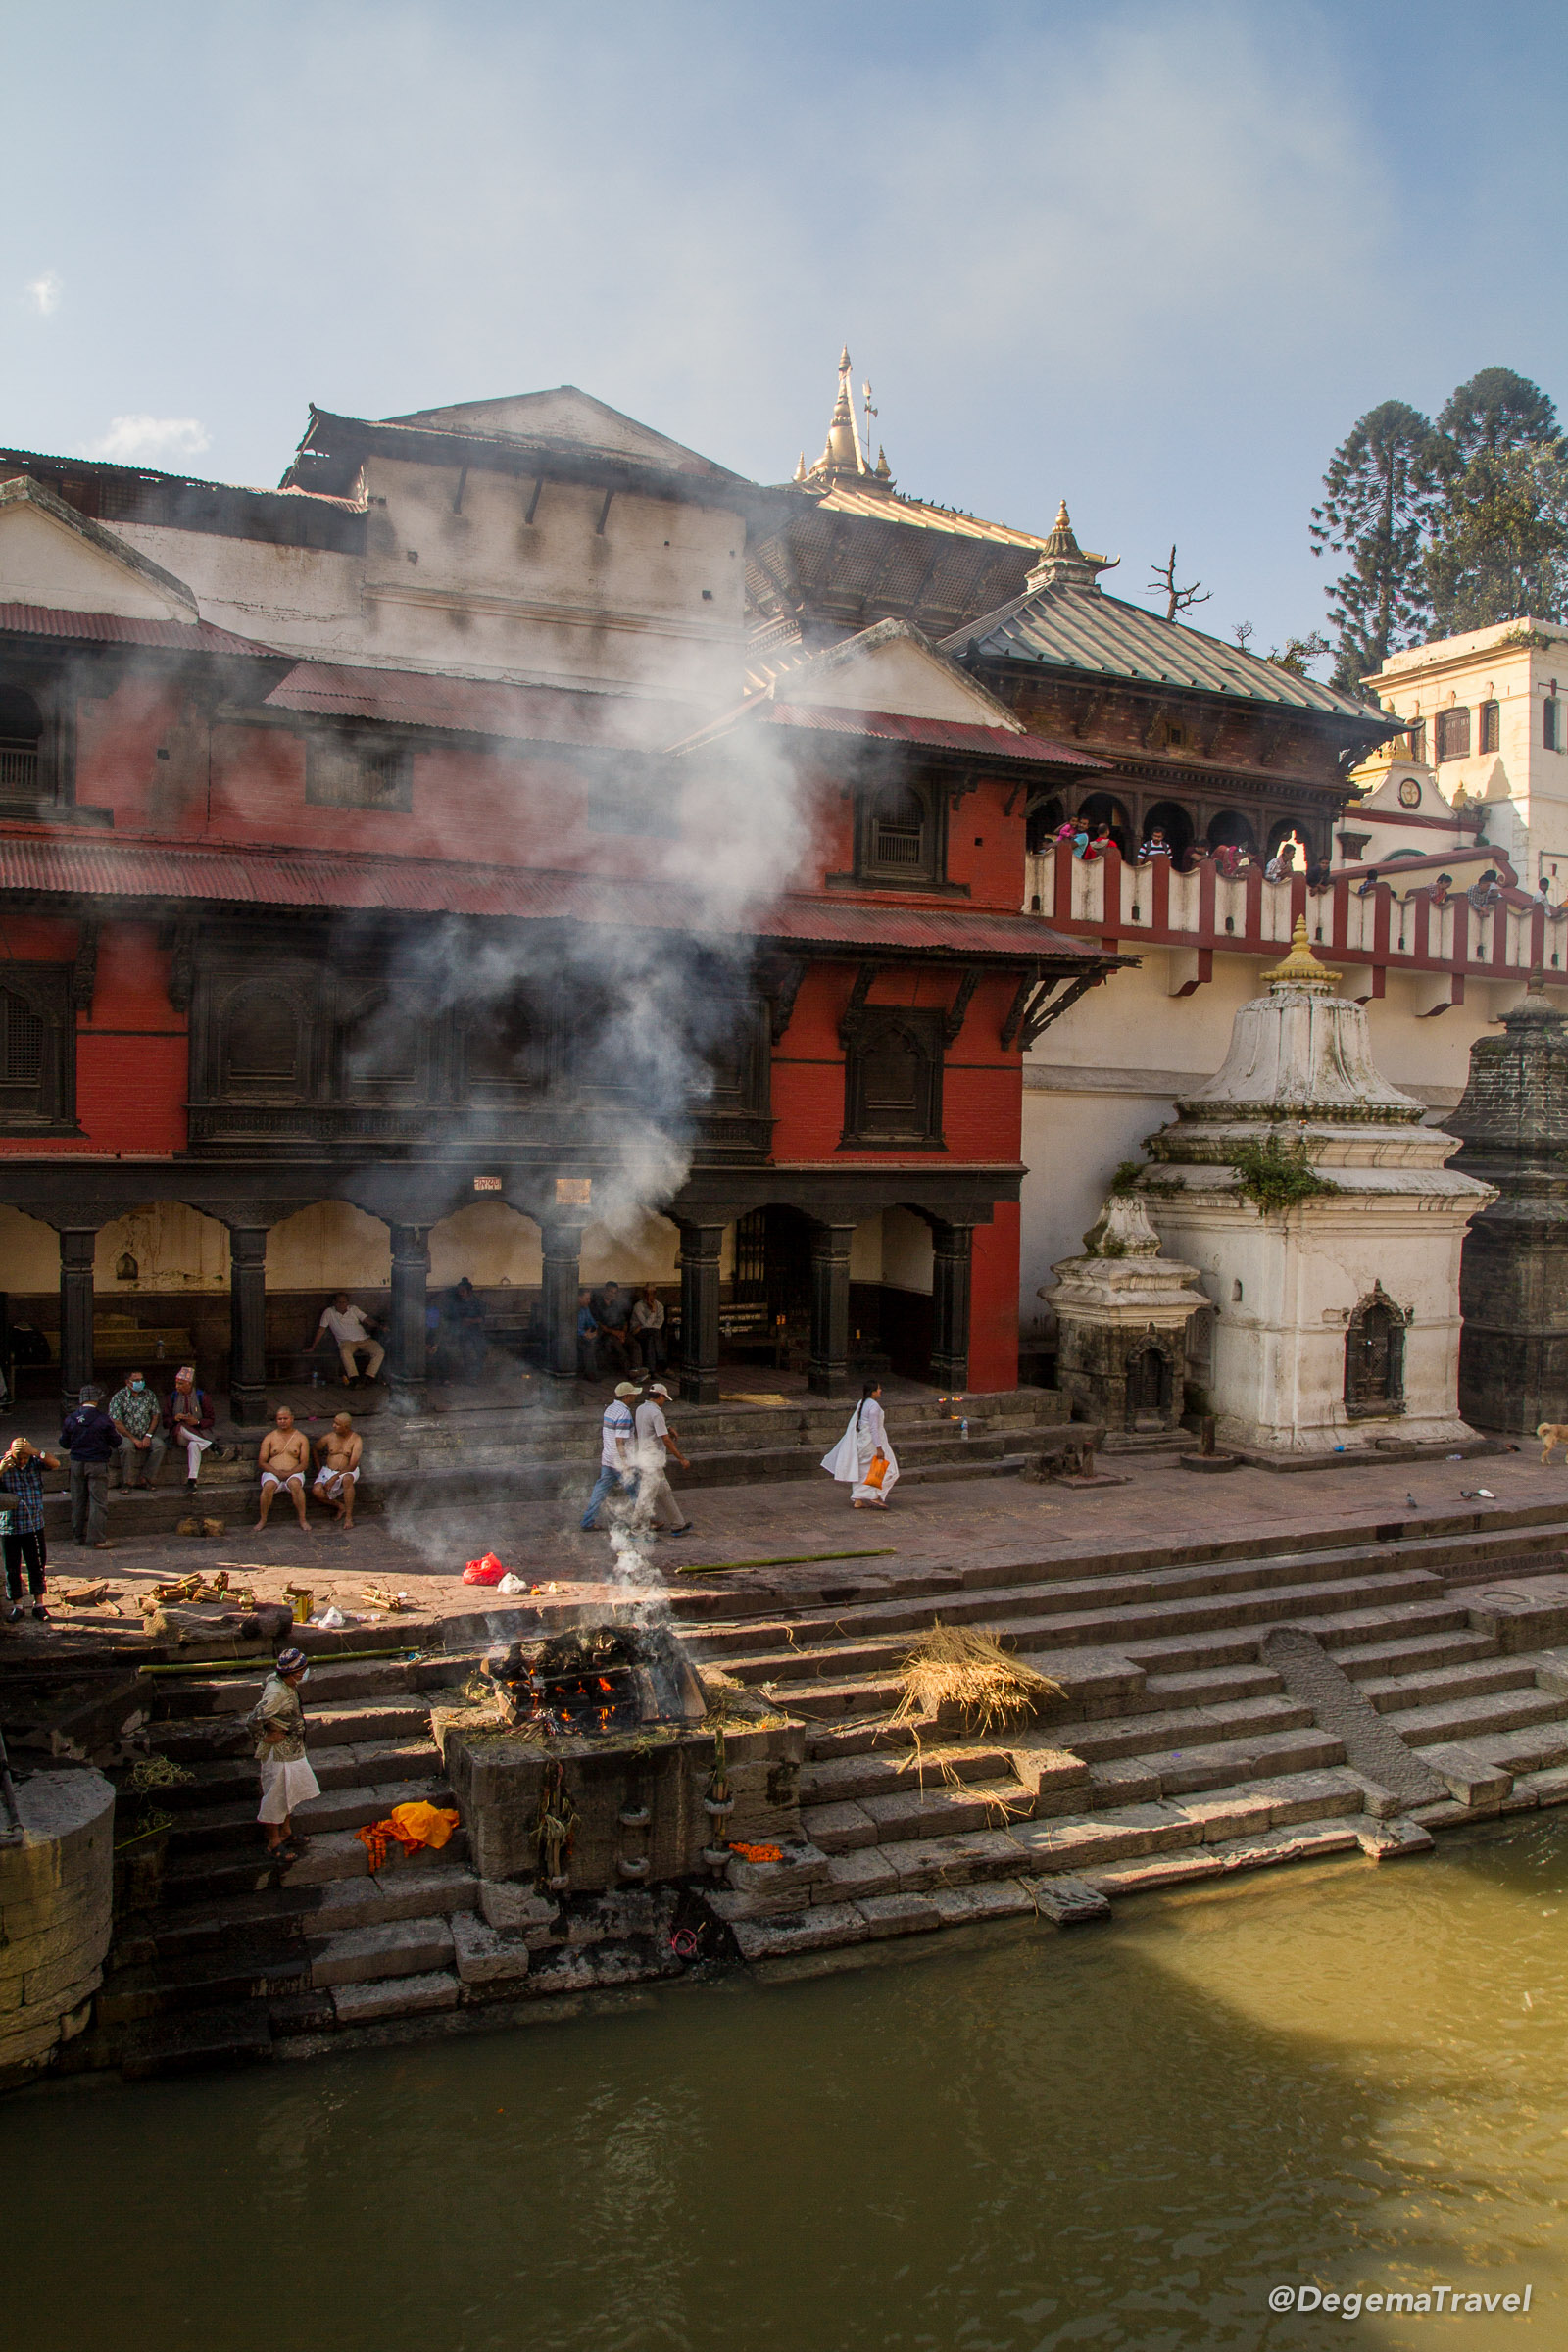 Funeral pyres at Pashupatinath Temple in Kathmandu, Nepal